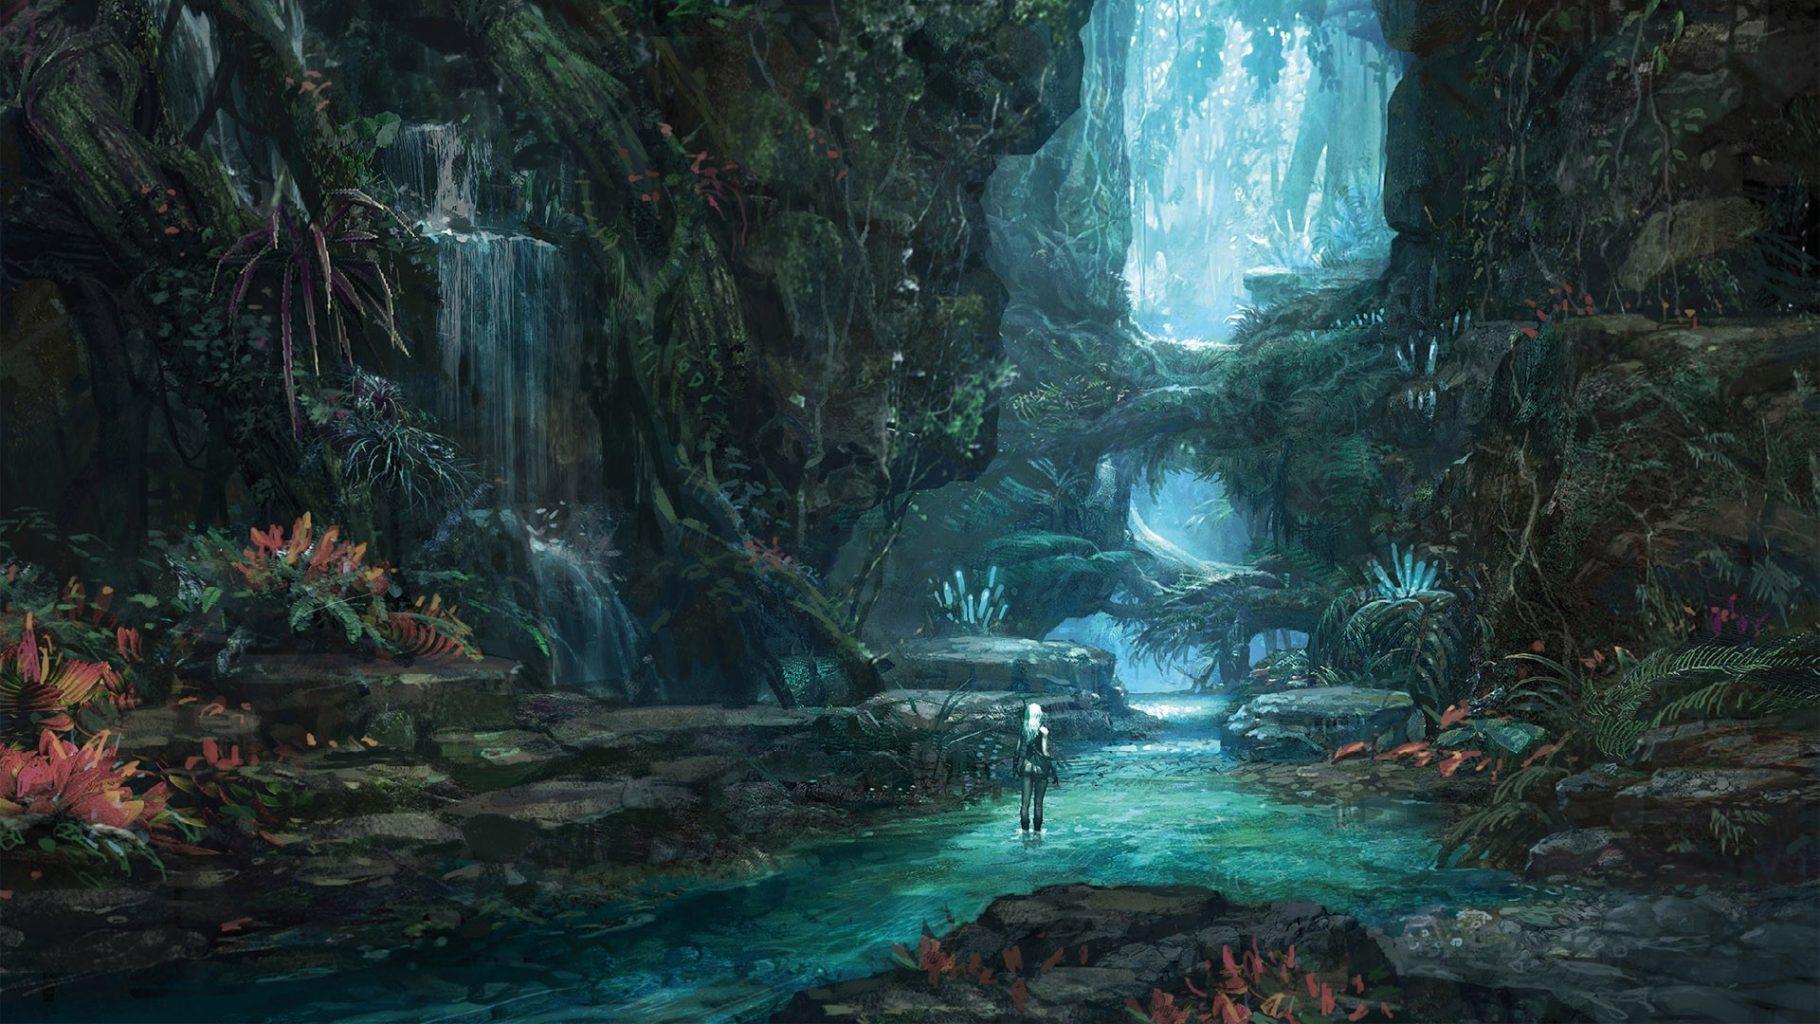 imagenes de bosques encantados